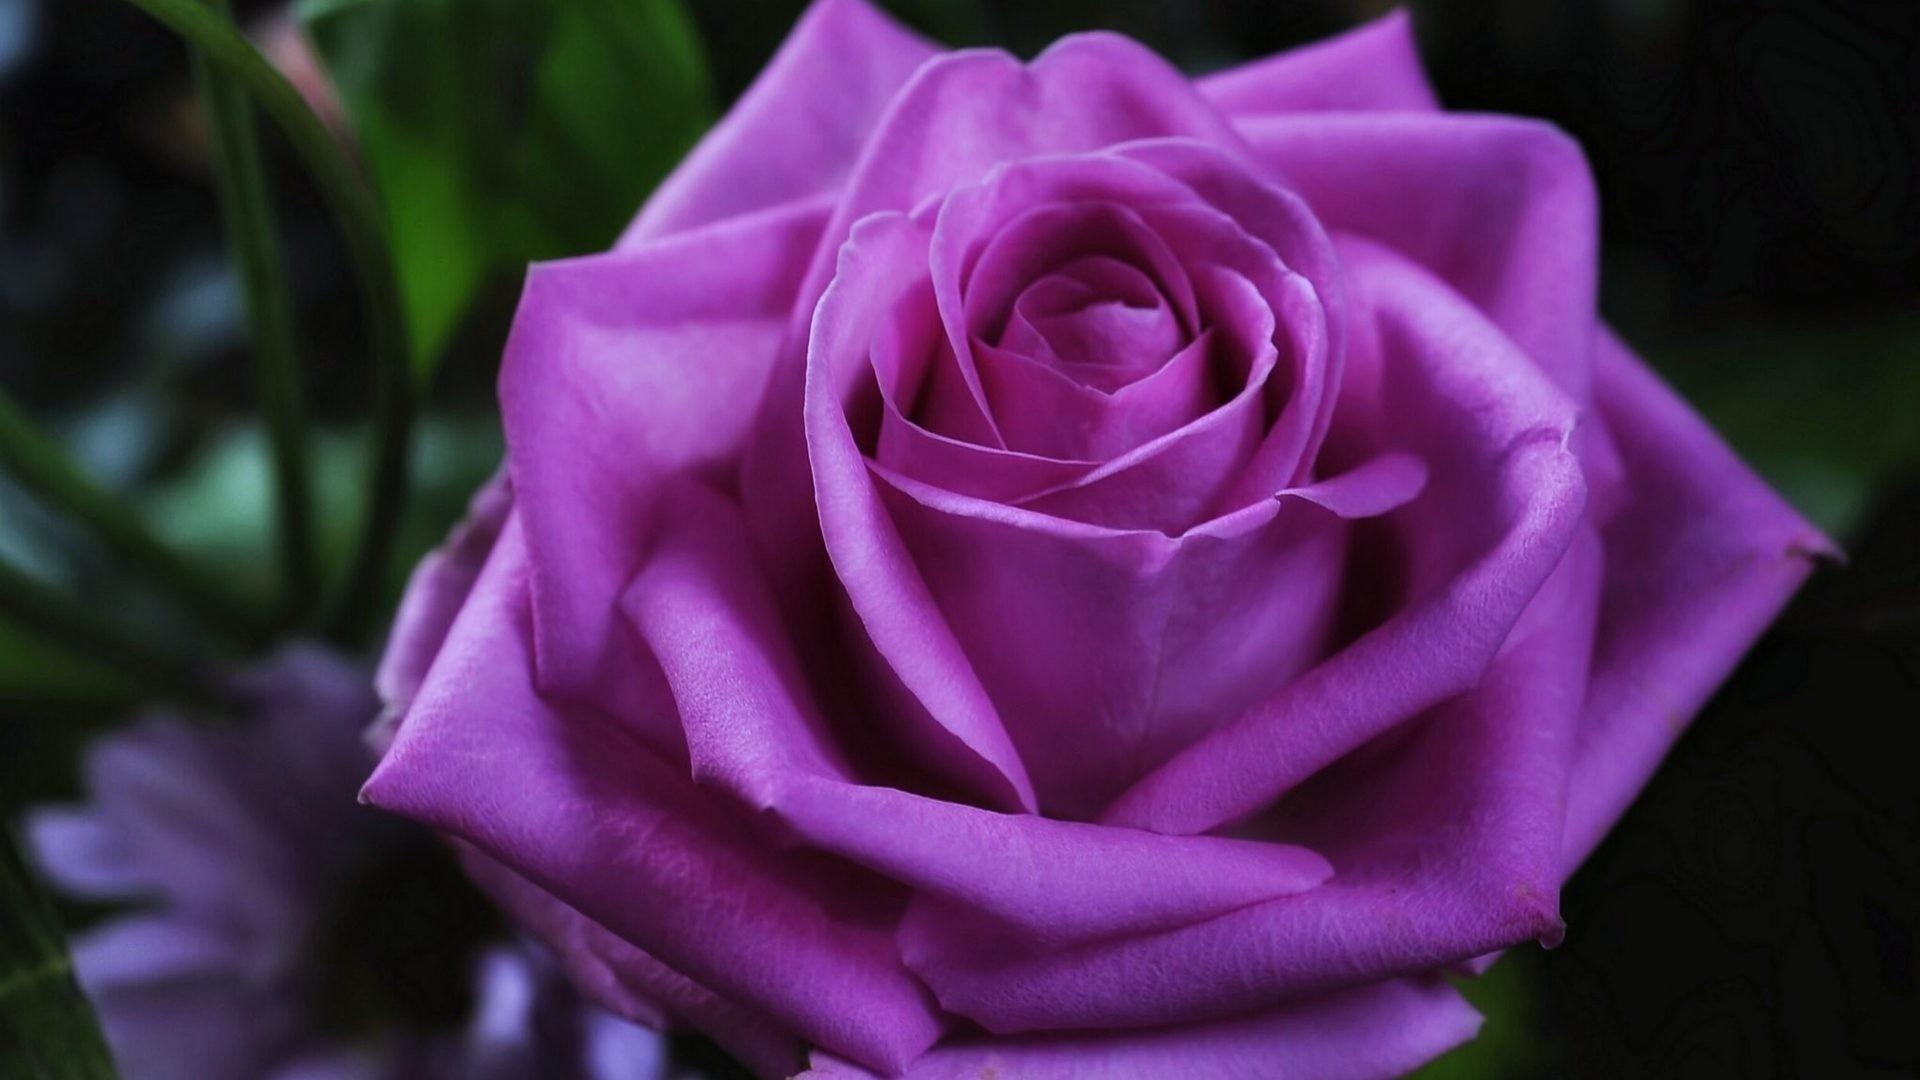 Love Tag – Flowers Emotions Purple Love Violet Spring Life Rose Red Romance  New Nature Desktop